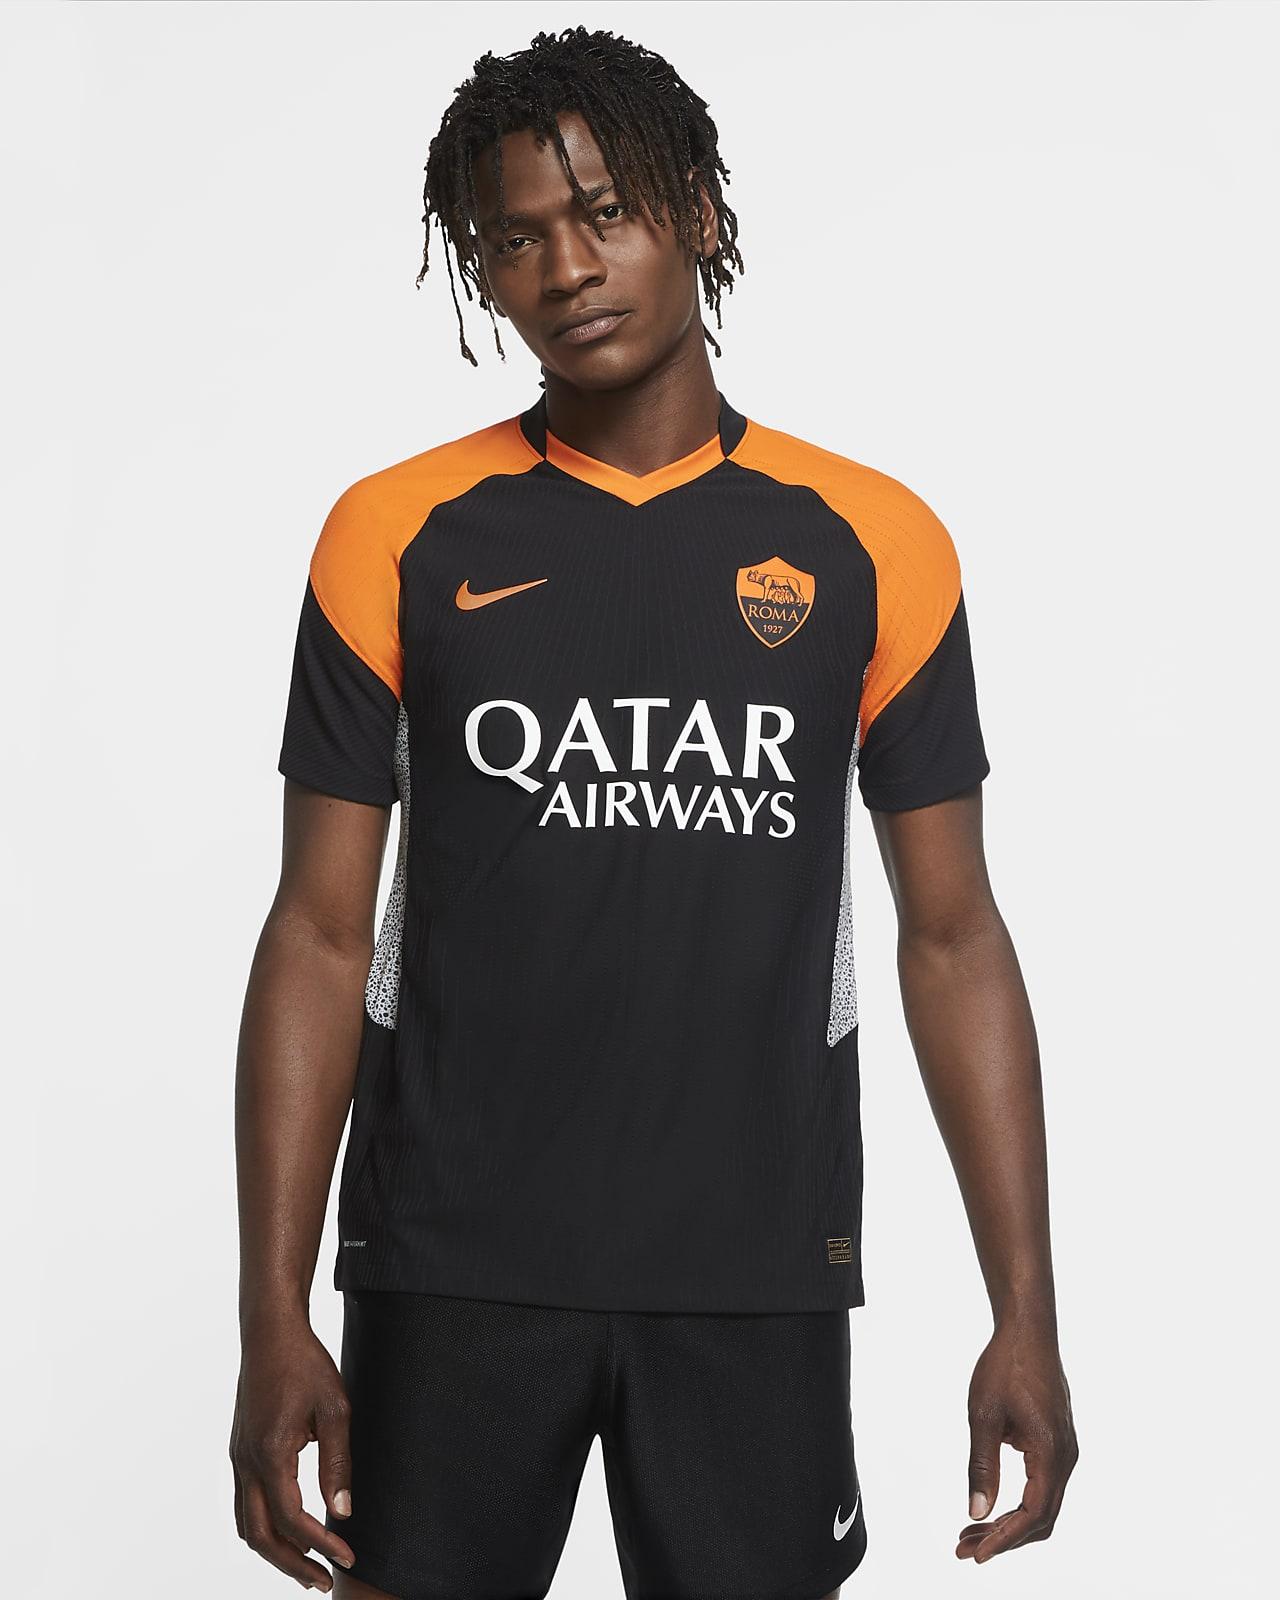 A.S. Roma 2020/21 Vapor Match Third-fodboldtrøje til mænd